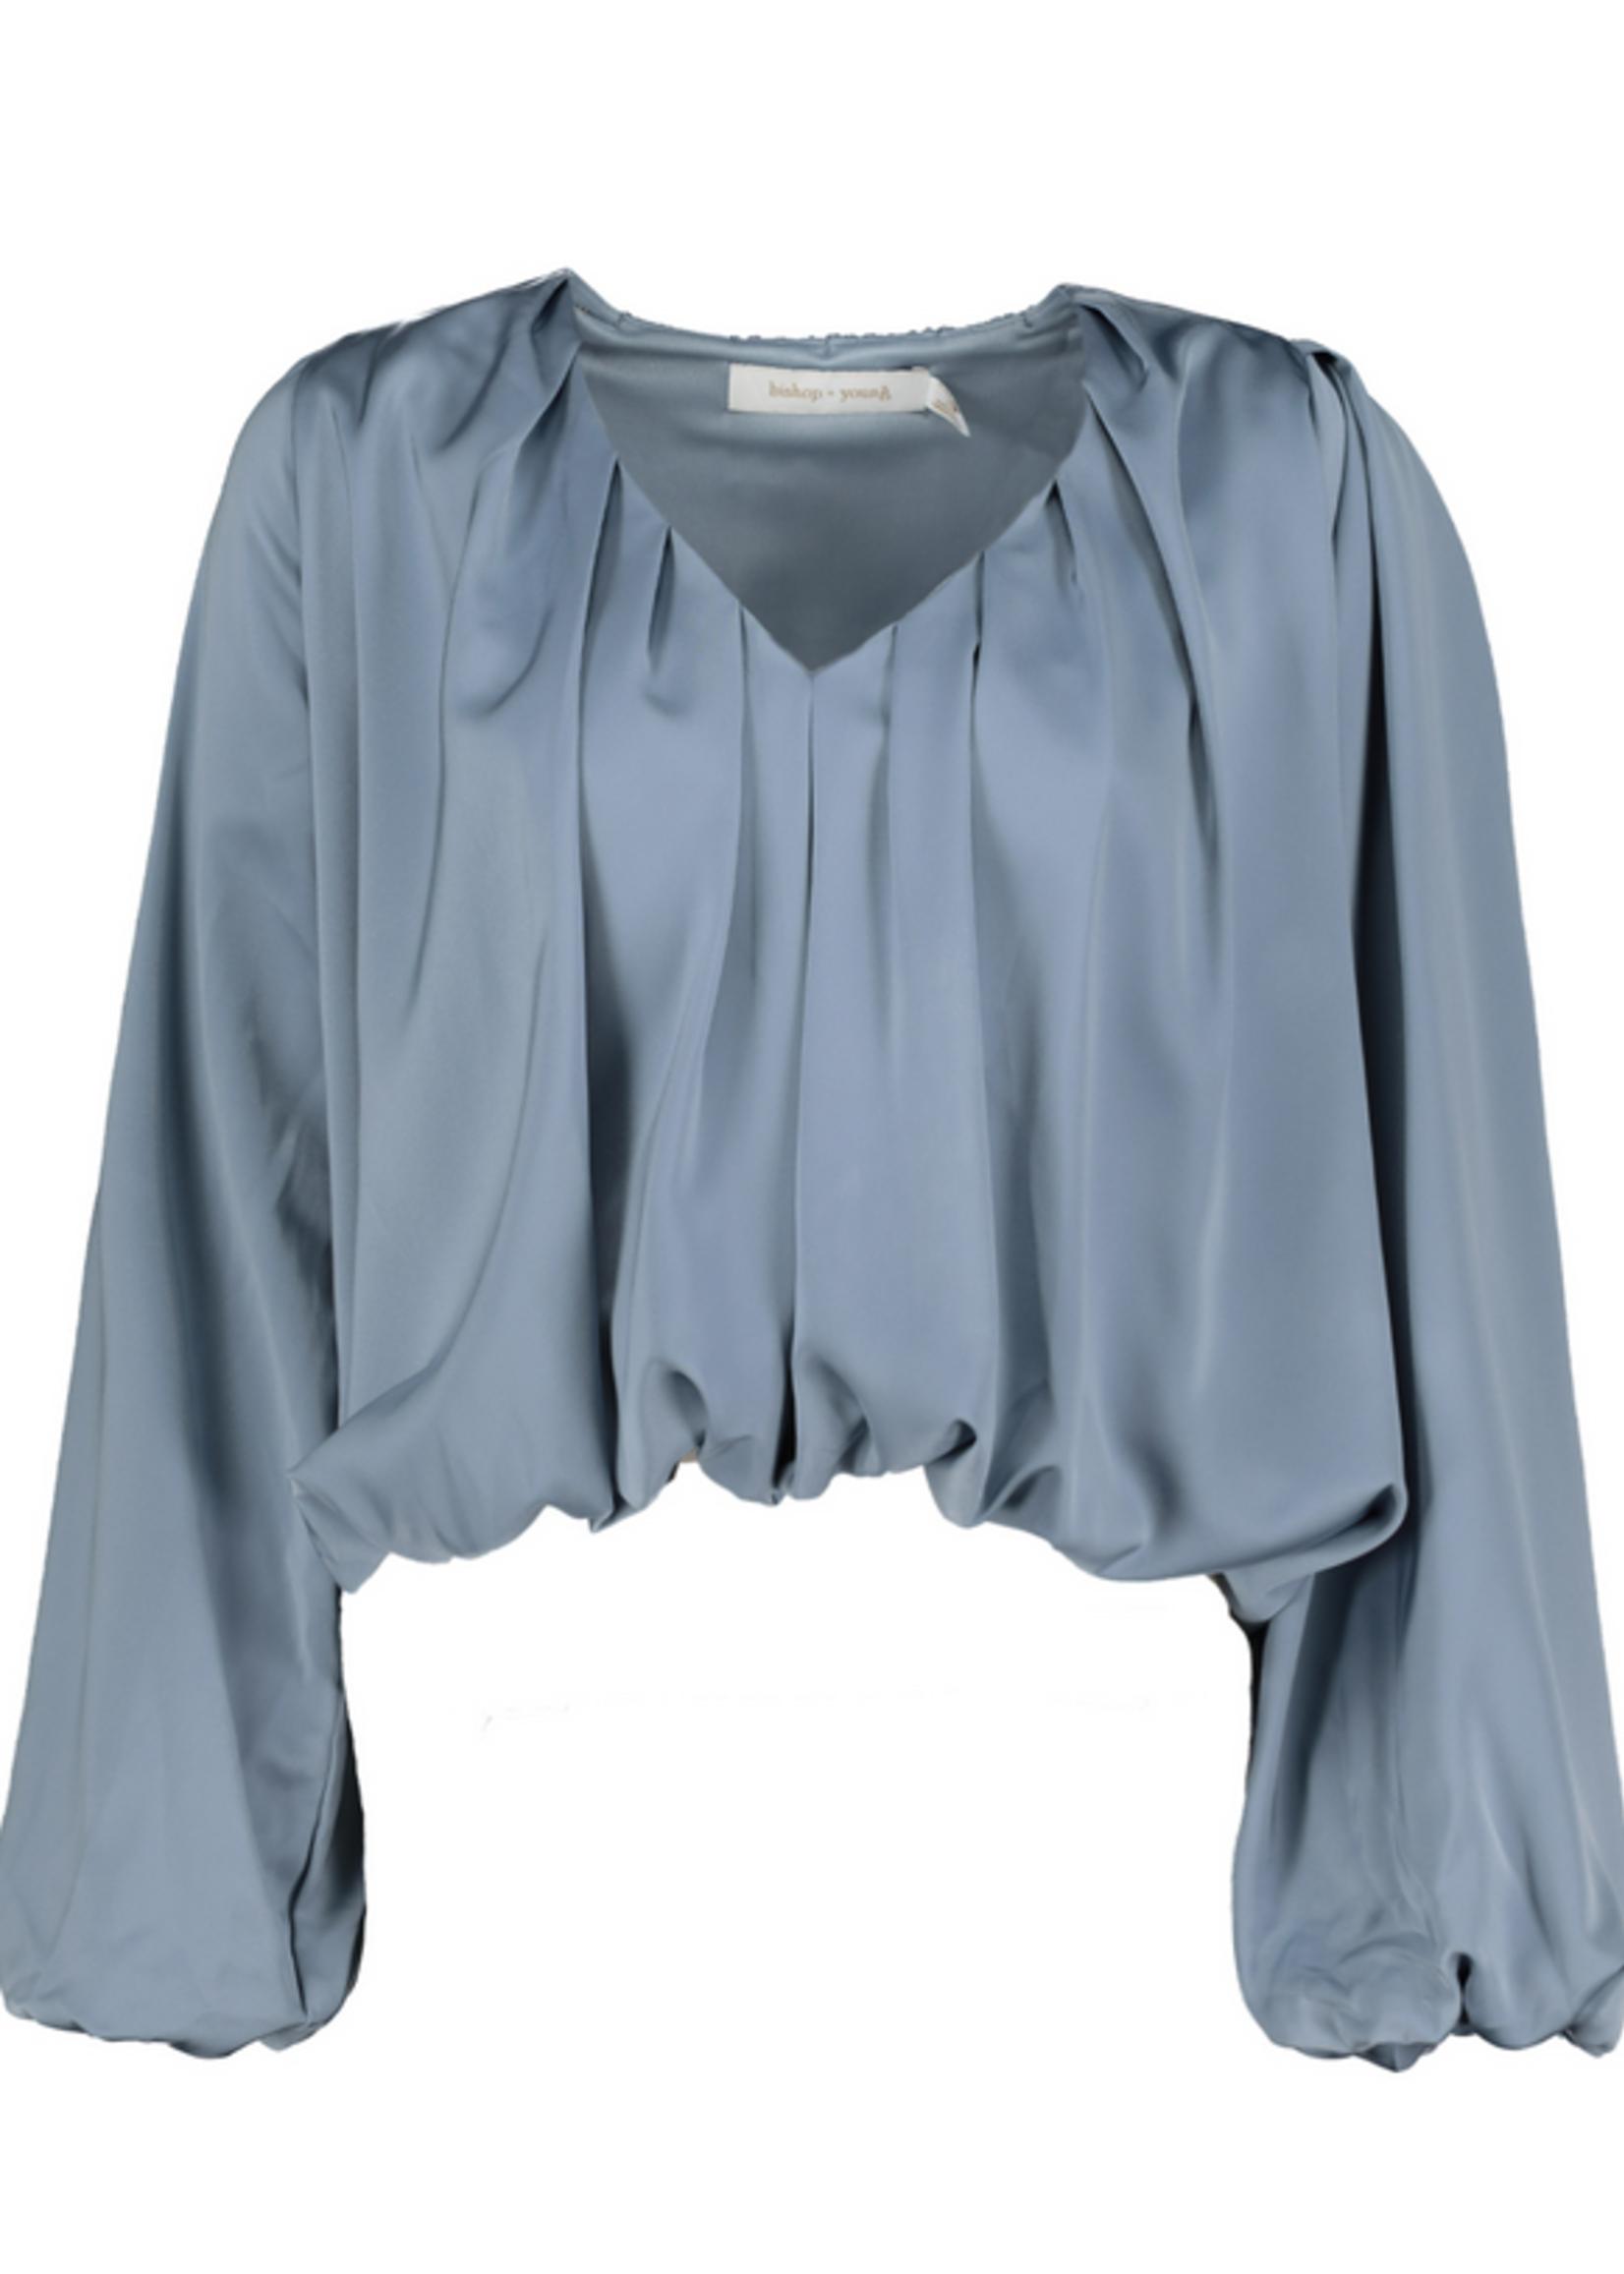 Elitaire Boutique Bubble Sleeve Top in Slate Blue